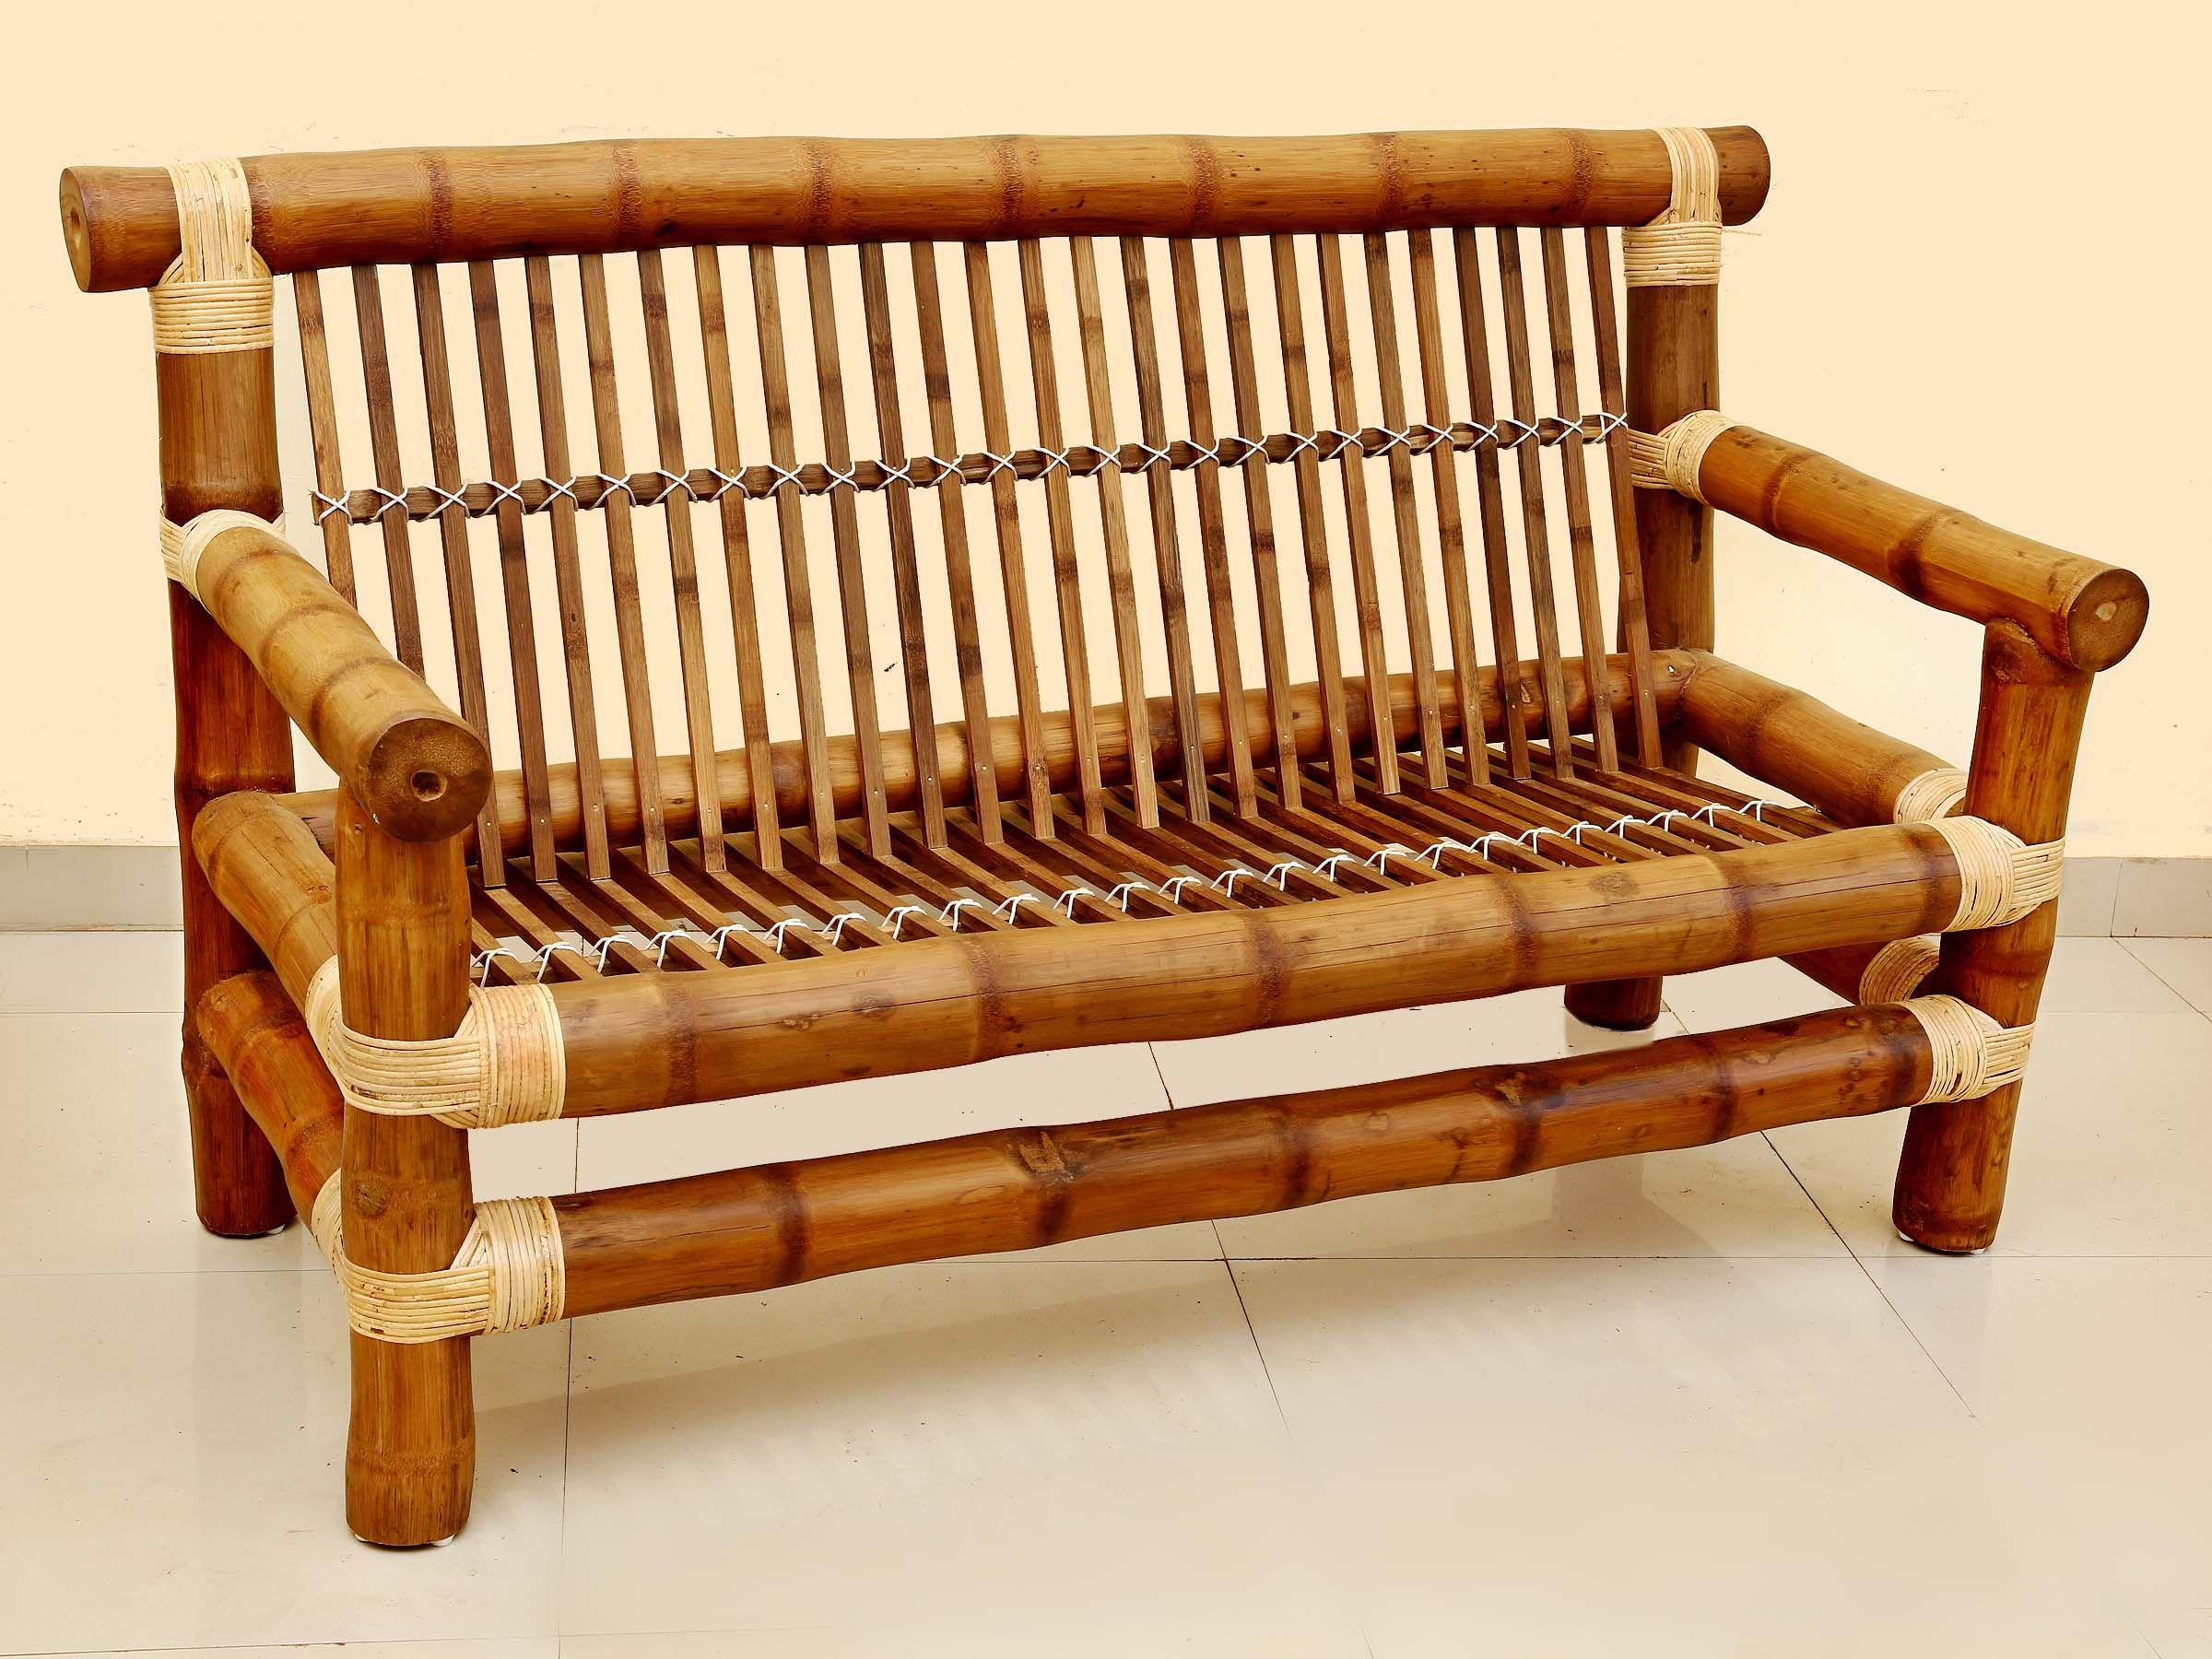 Kerala Bamboo Corporation Ltd Bamboo Furniture Diy Bamboo Sofa Bamboo Furniture Design